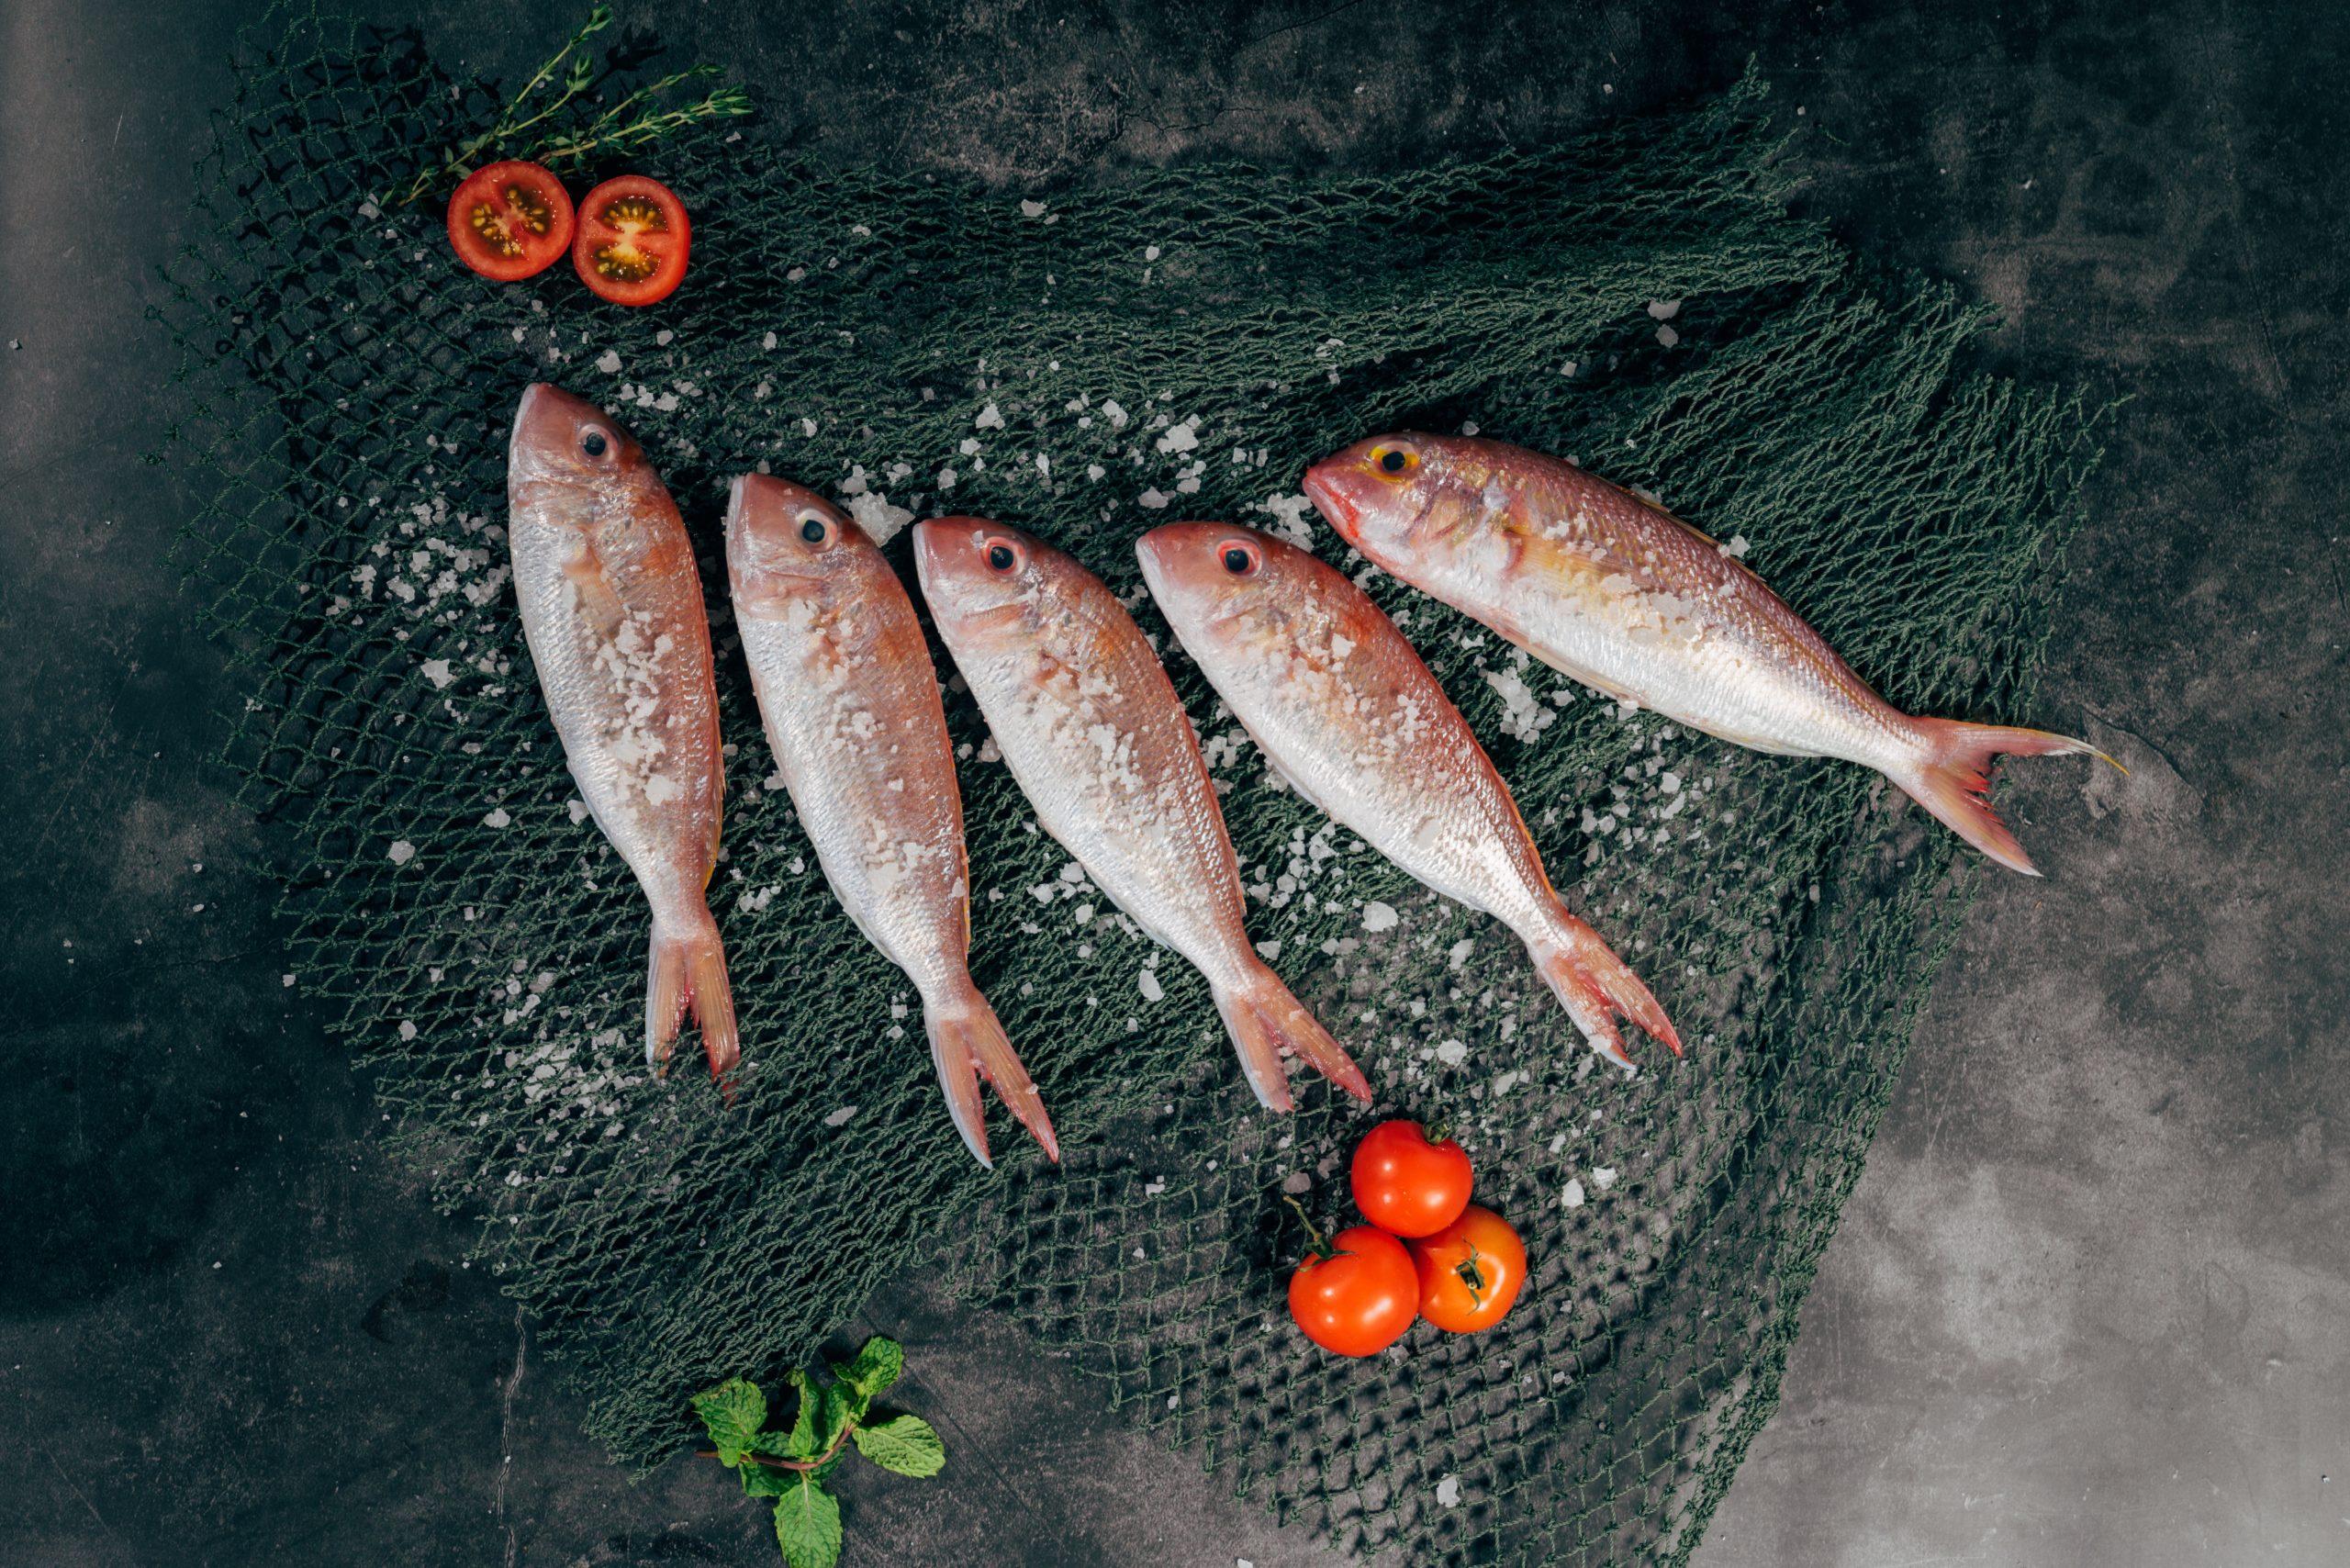 five fish between tomatoes on black net